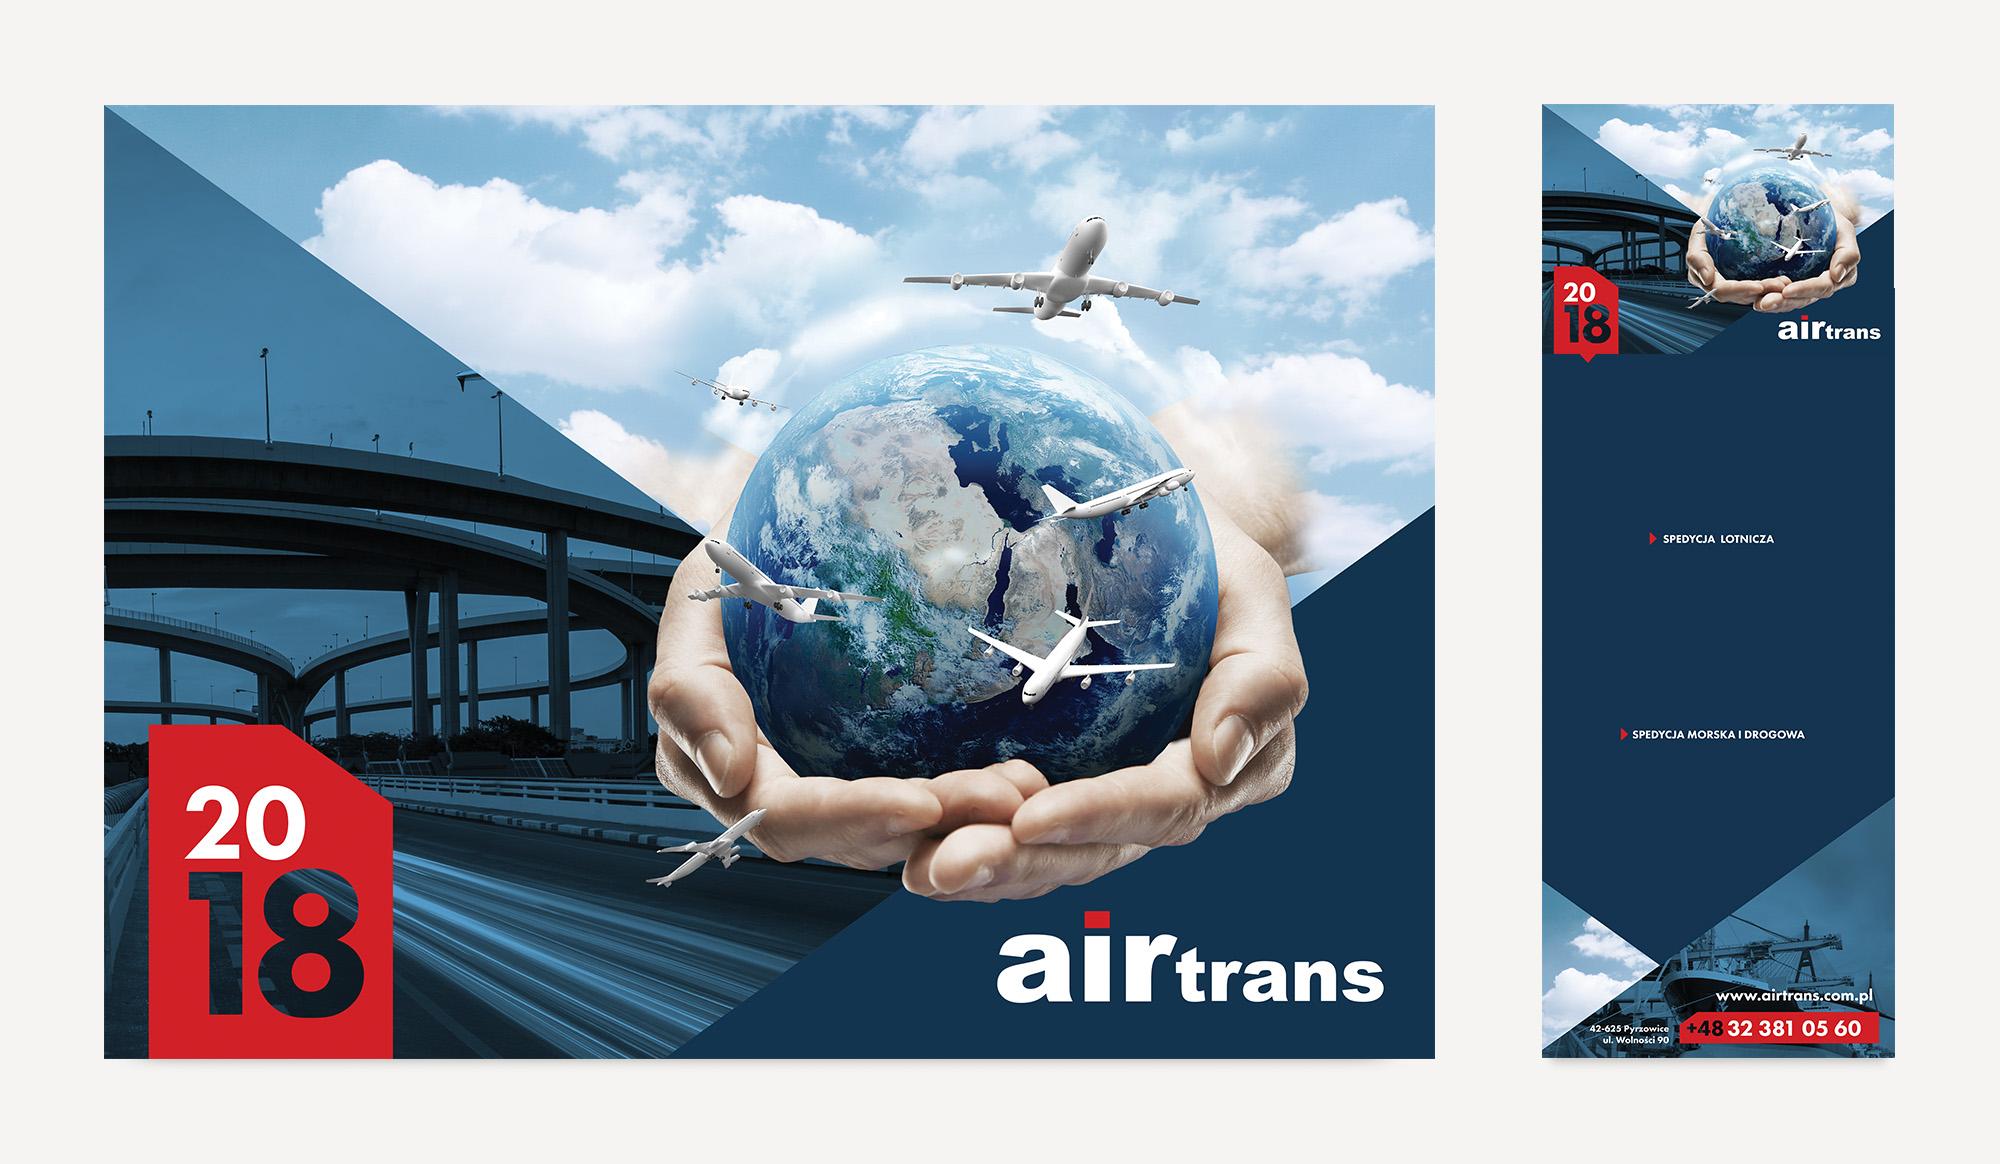 airtrans_realizacja_5.jpg